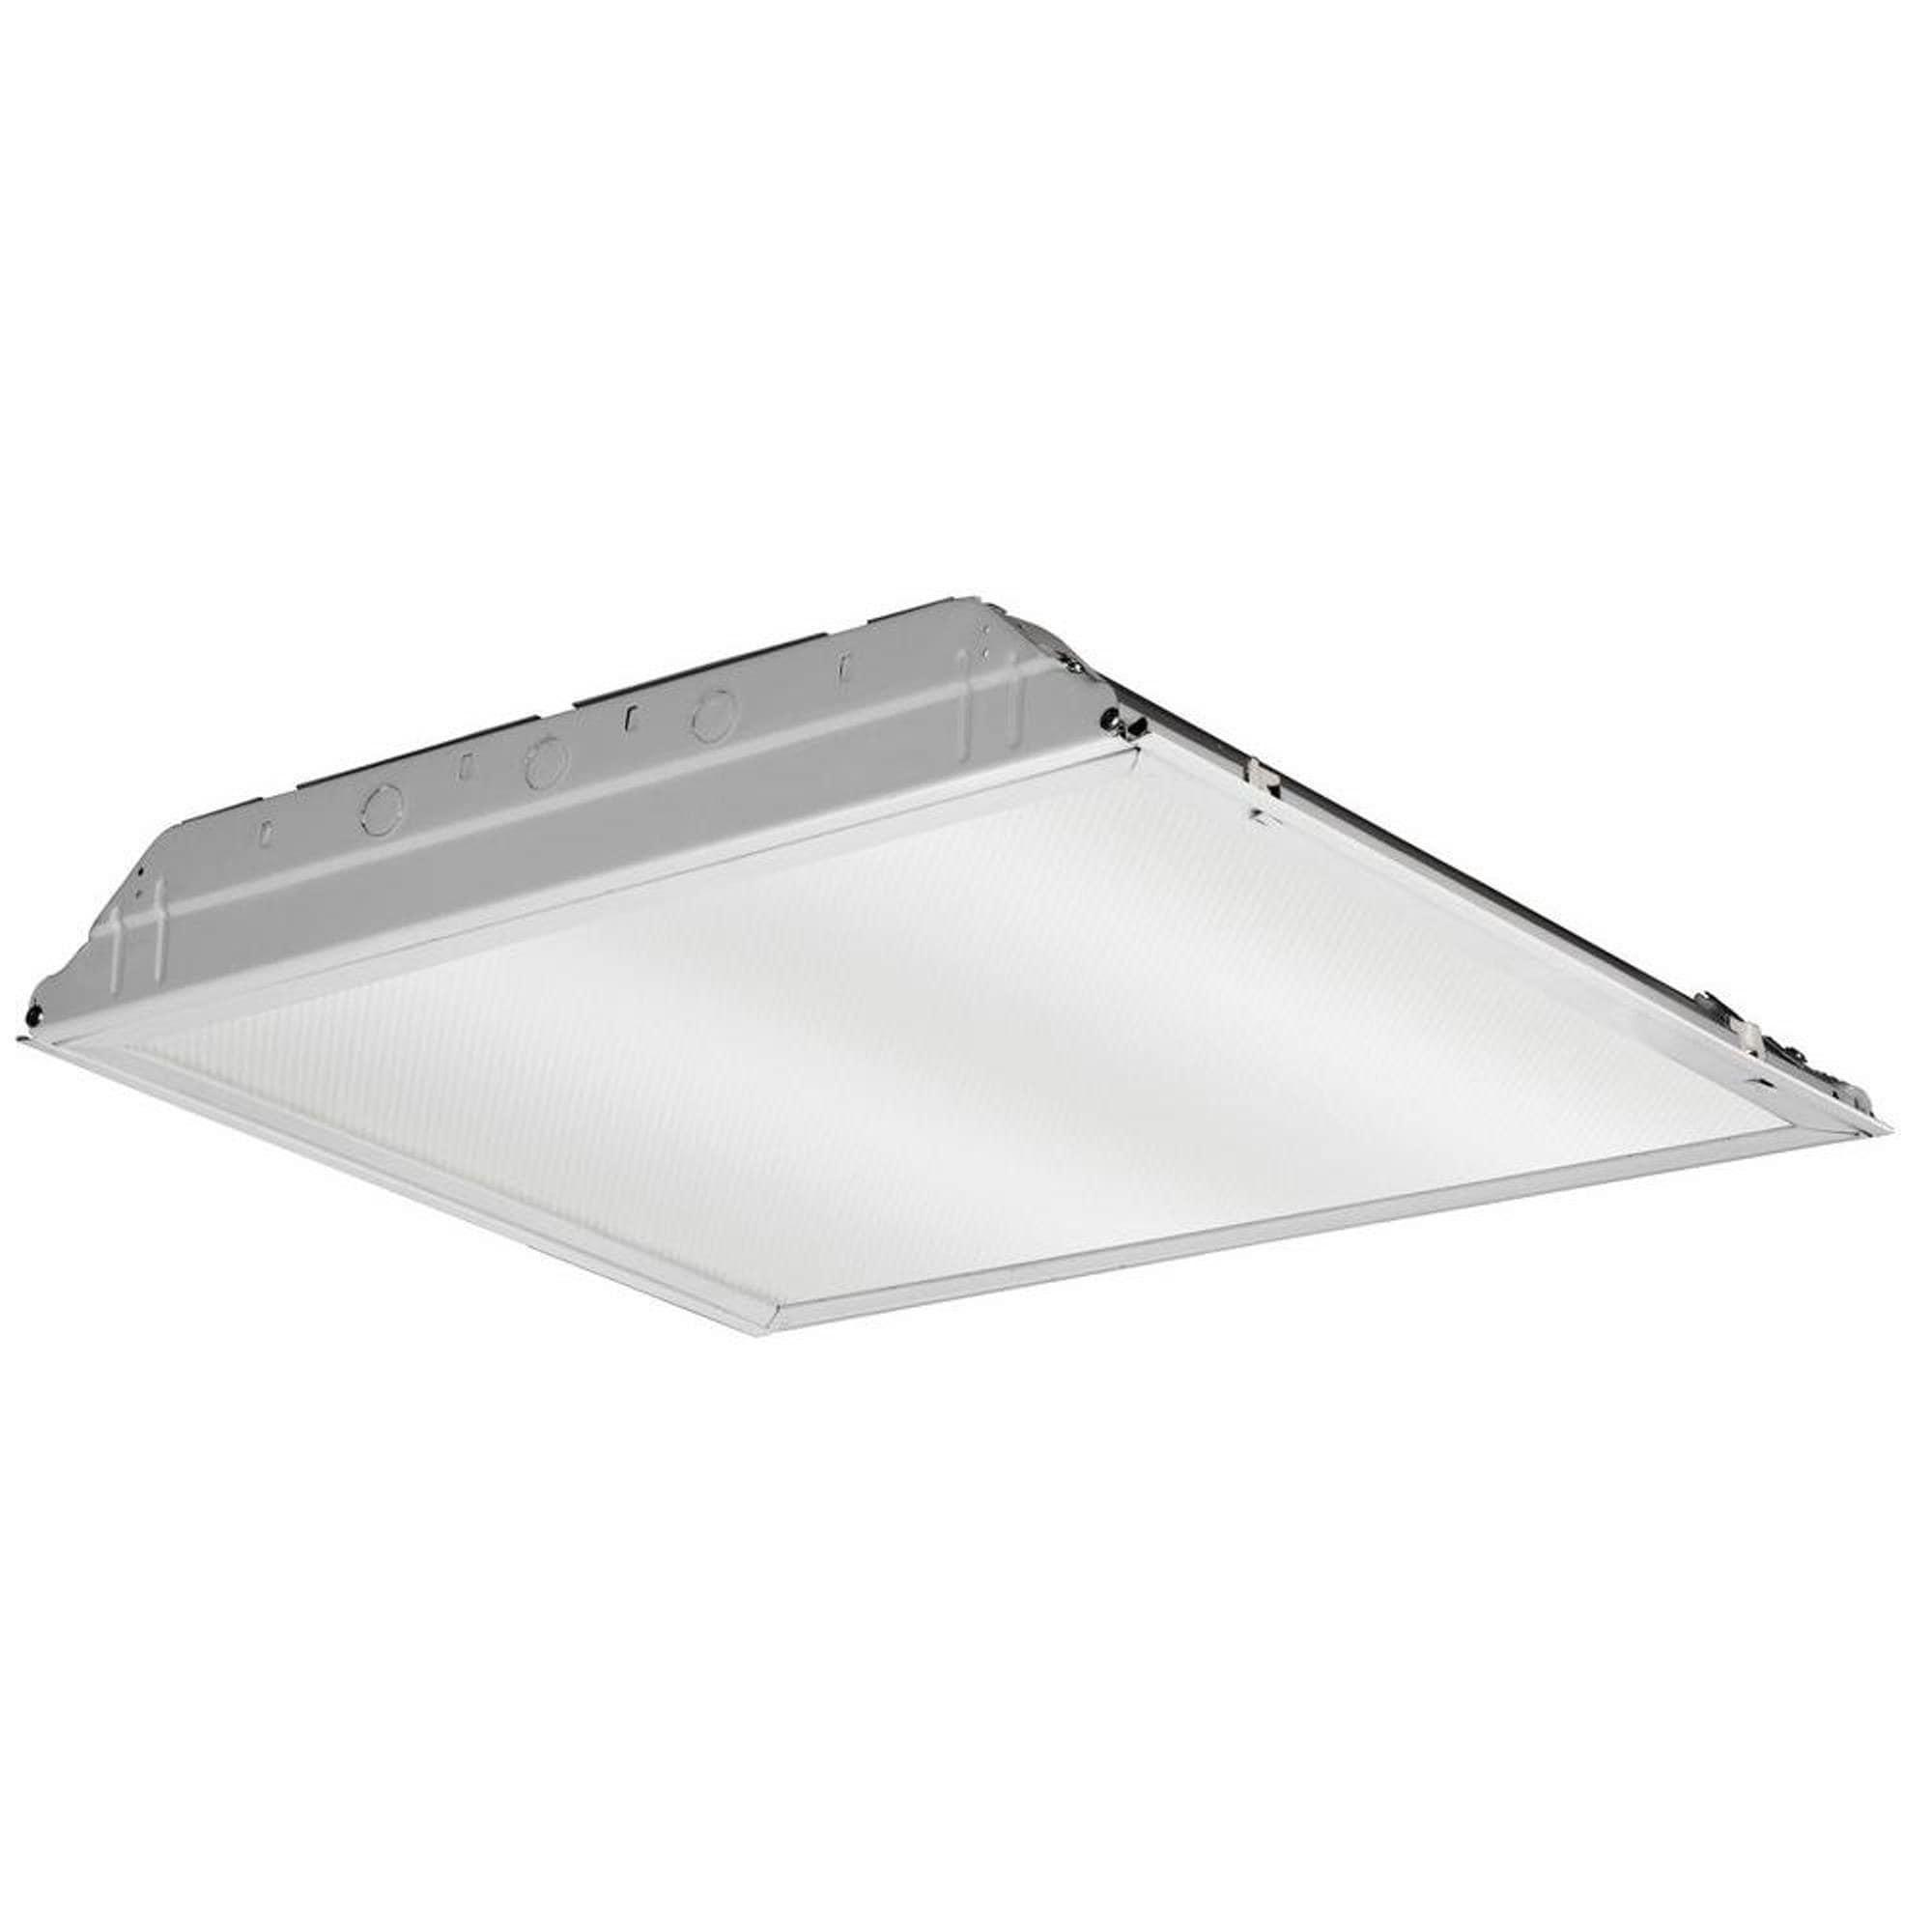 Lithonia Lighting White Metal 2-foot 3500K LED Lay-In Tro...